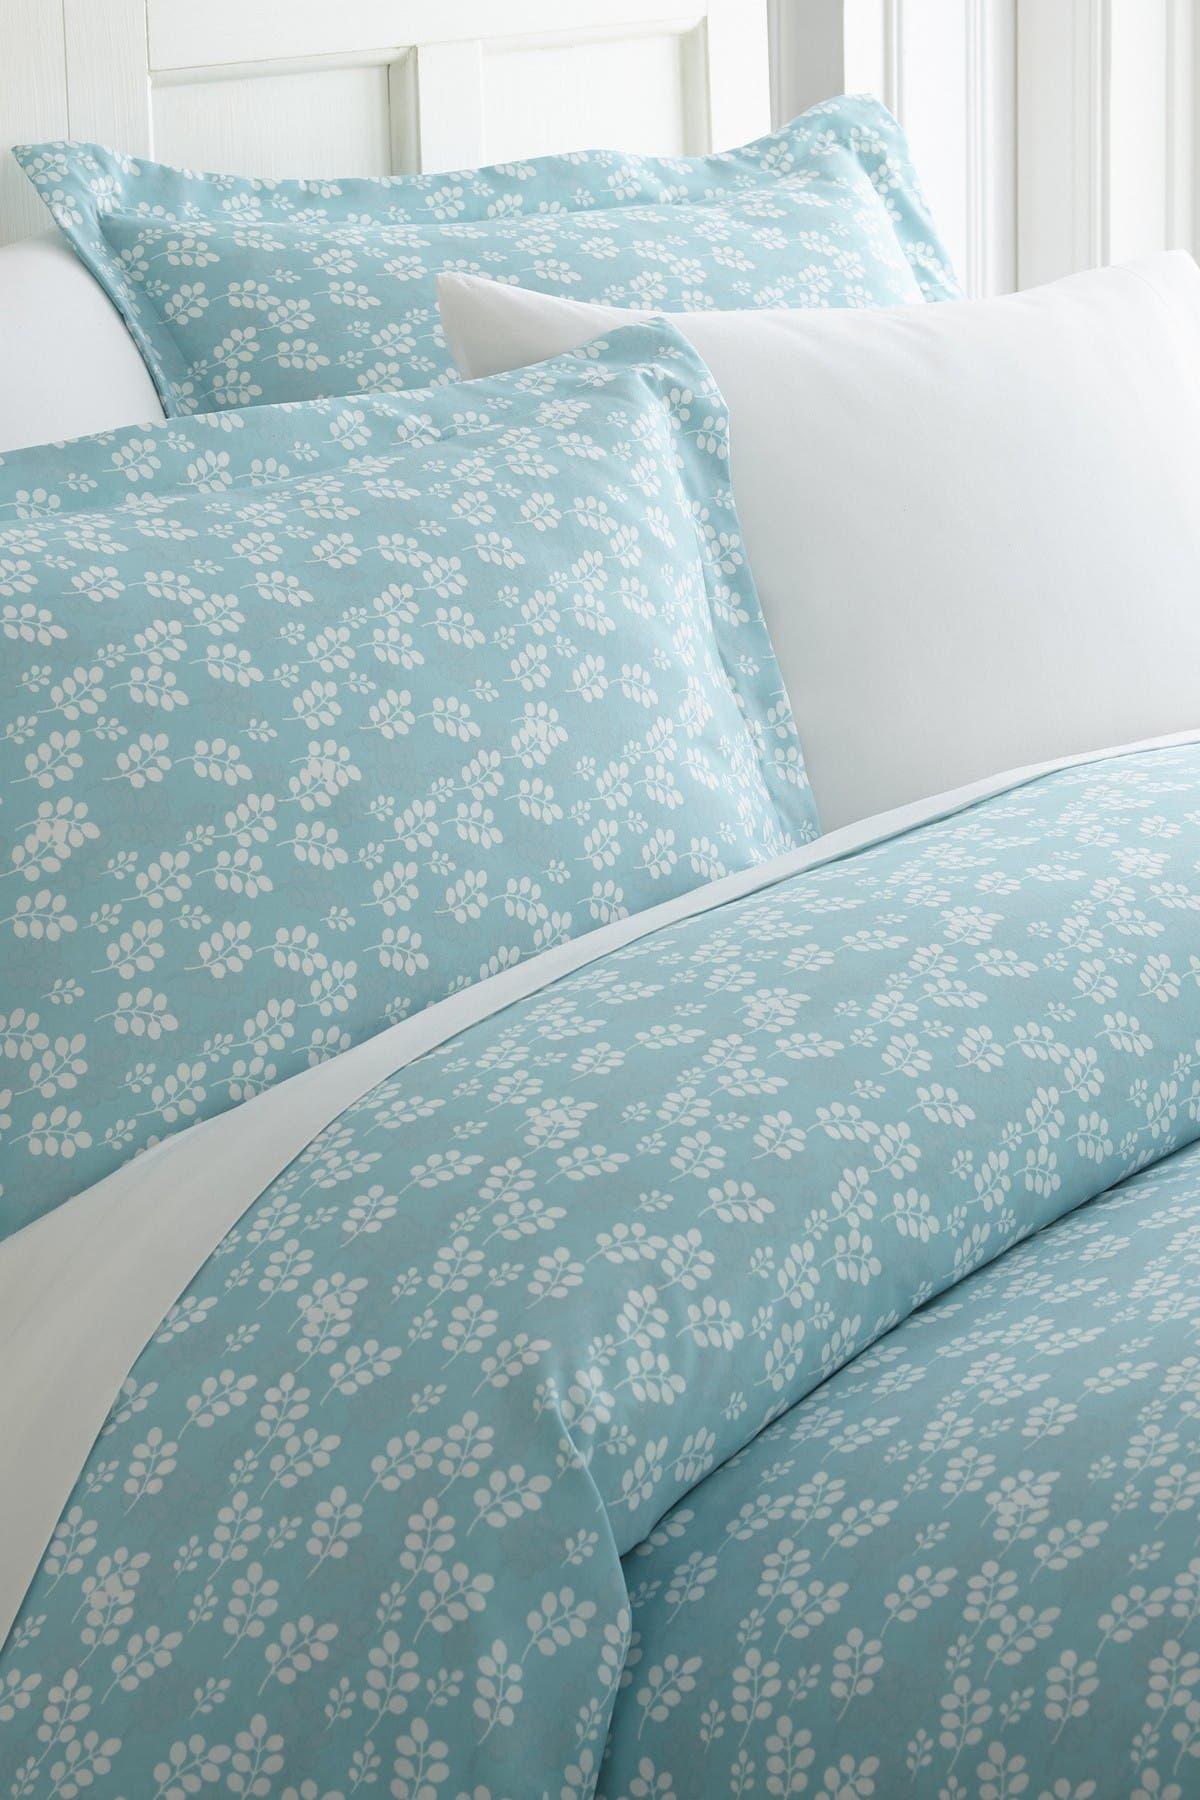 Ienjoy Home Home Spun Premium Ultra Soft Wheatfield Pattern 3-piece Duvet Cover King Set In Pale